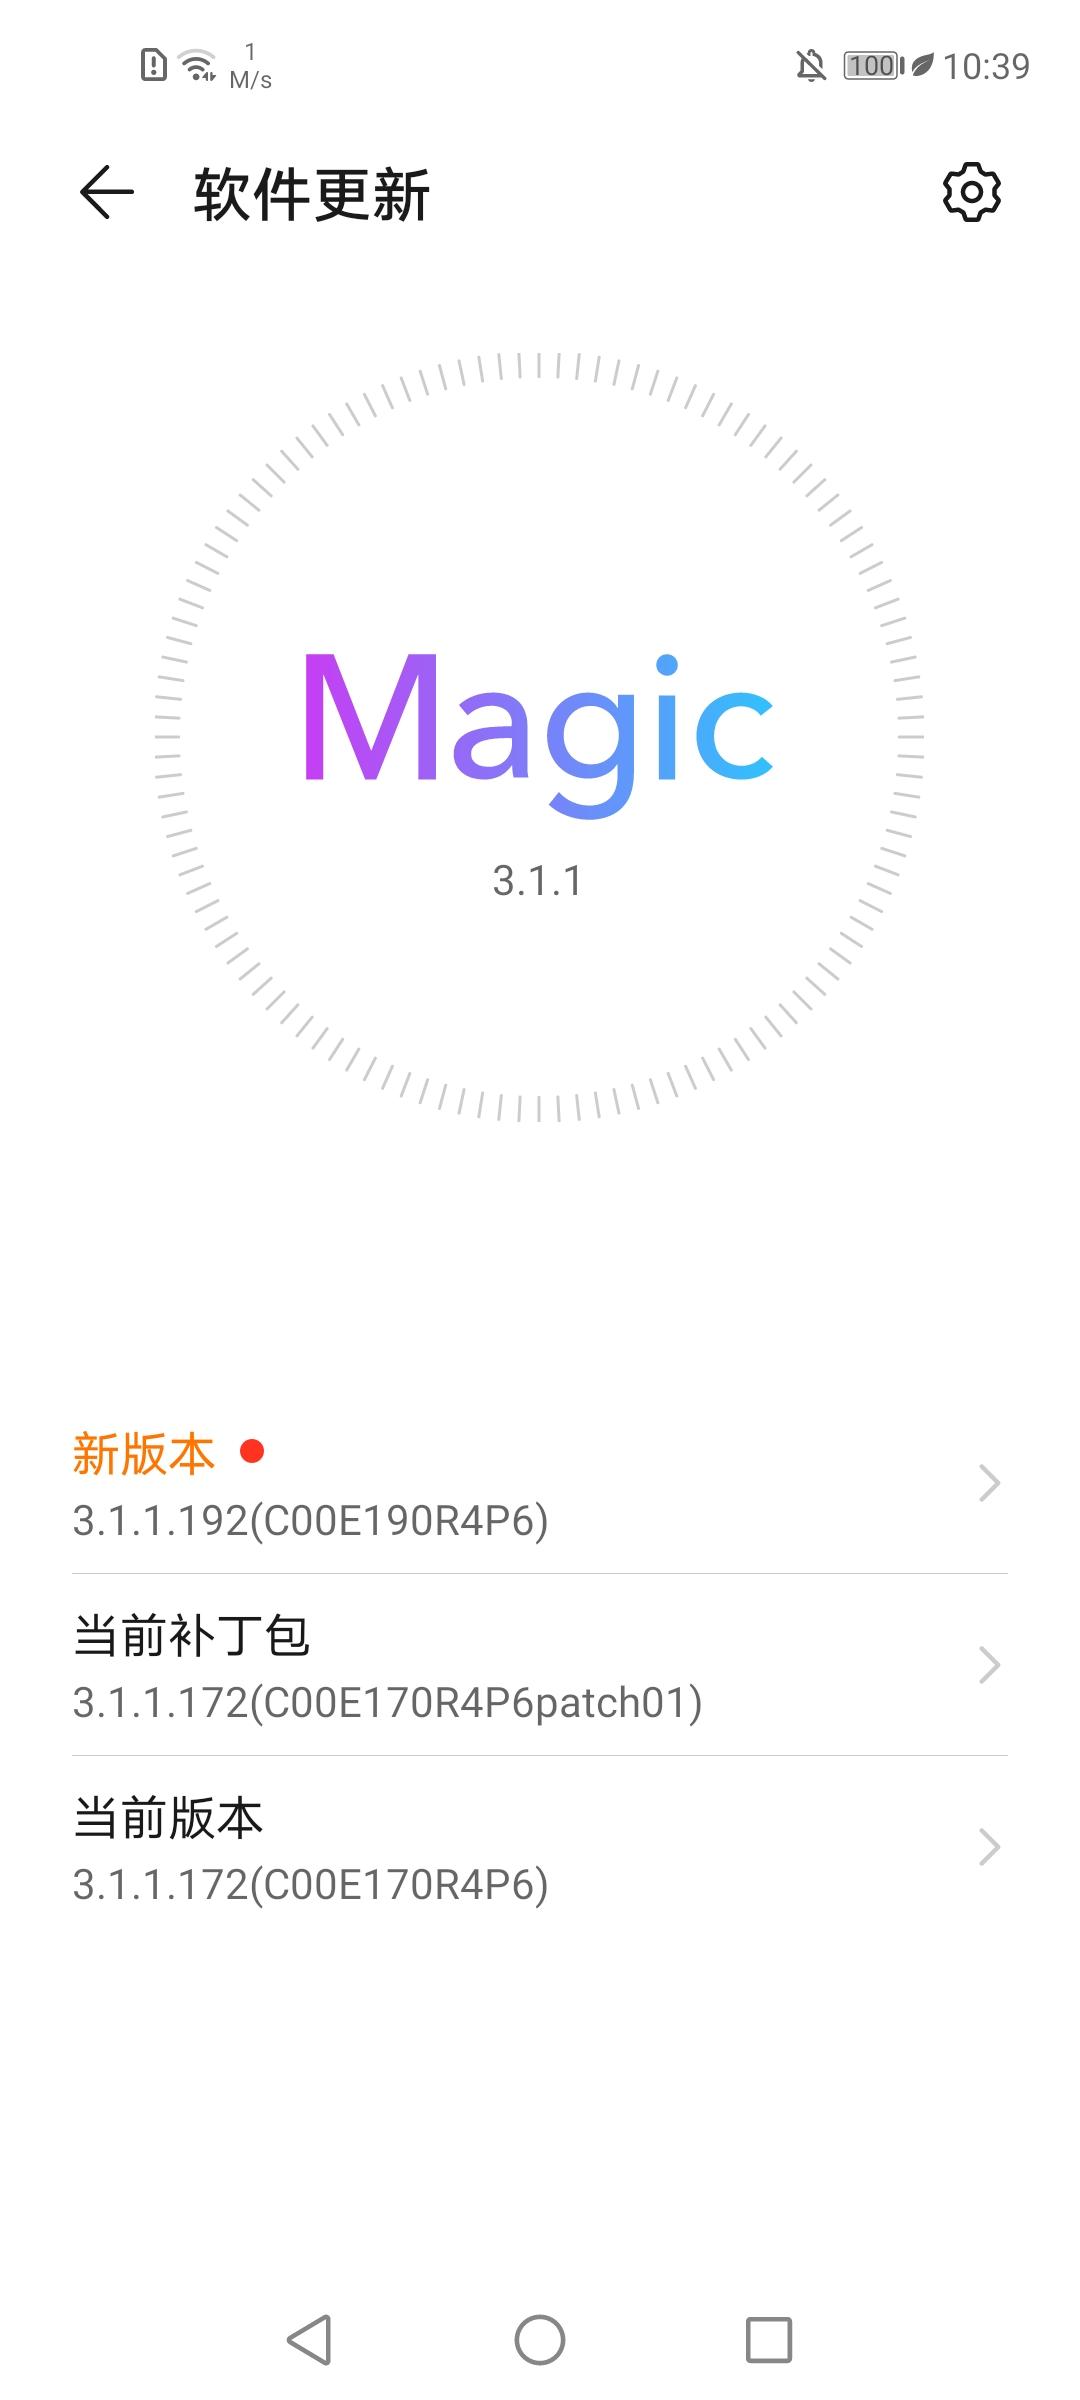 Screenshot_20200824_103937_com.huawei.android.hwouc.jpg